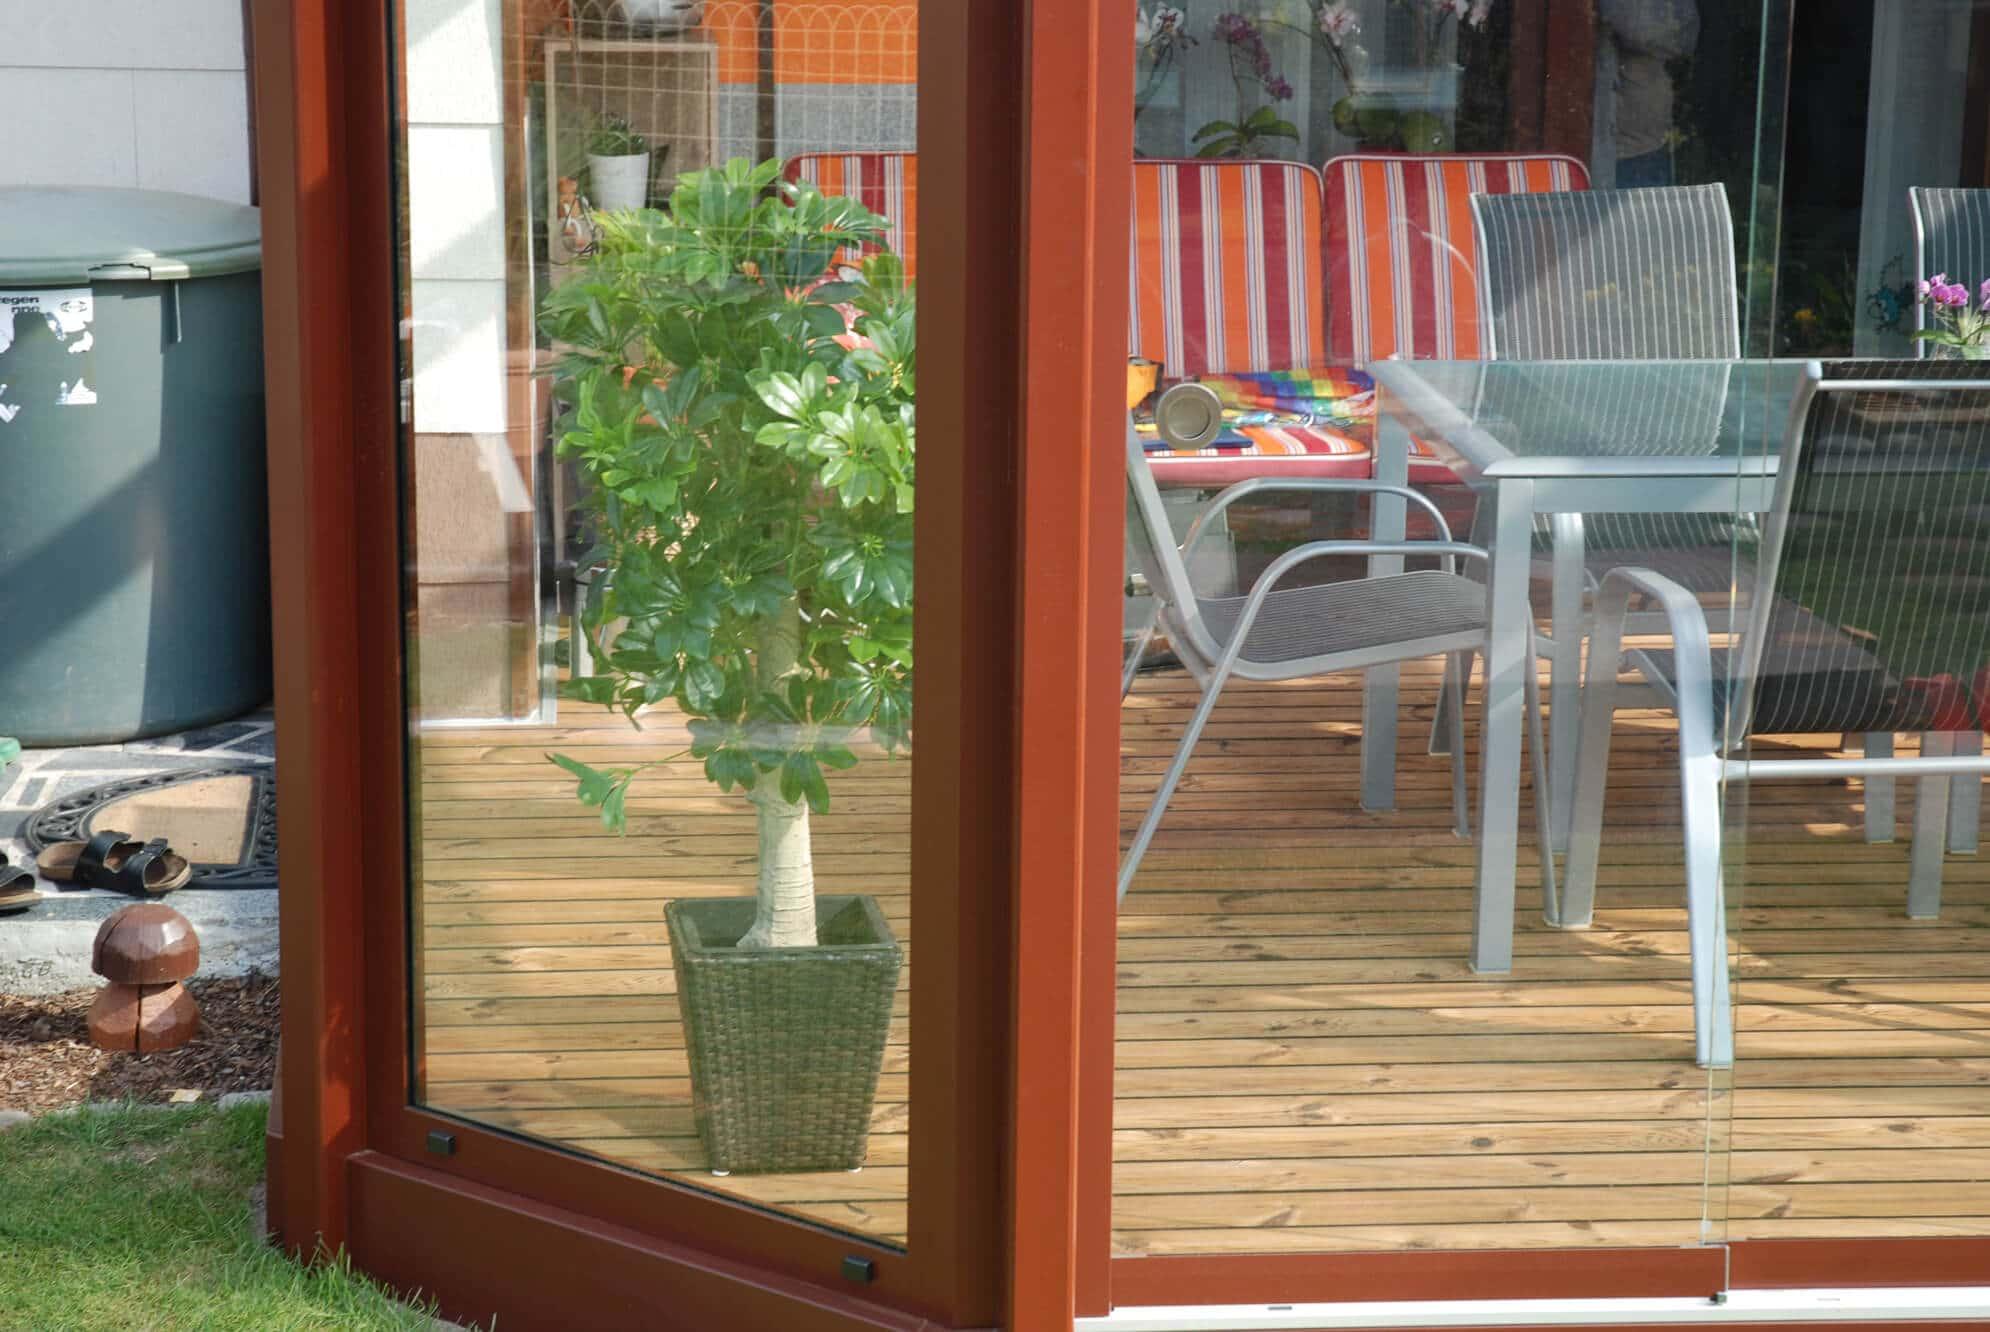 Sommergarten Windschutz Glas